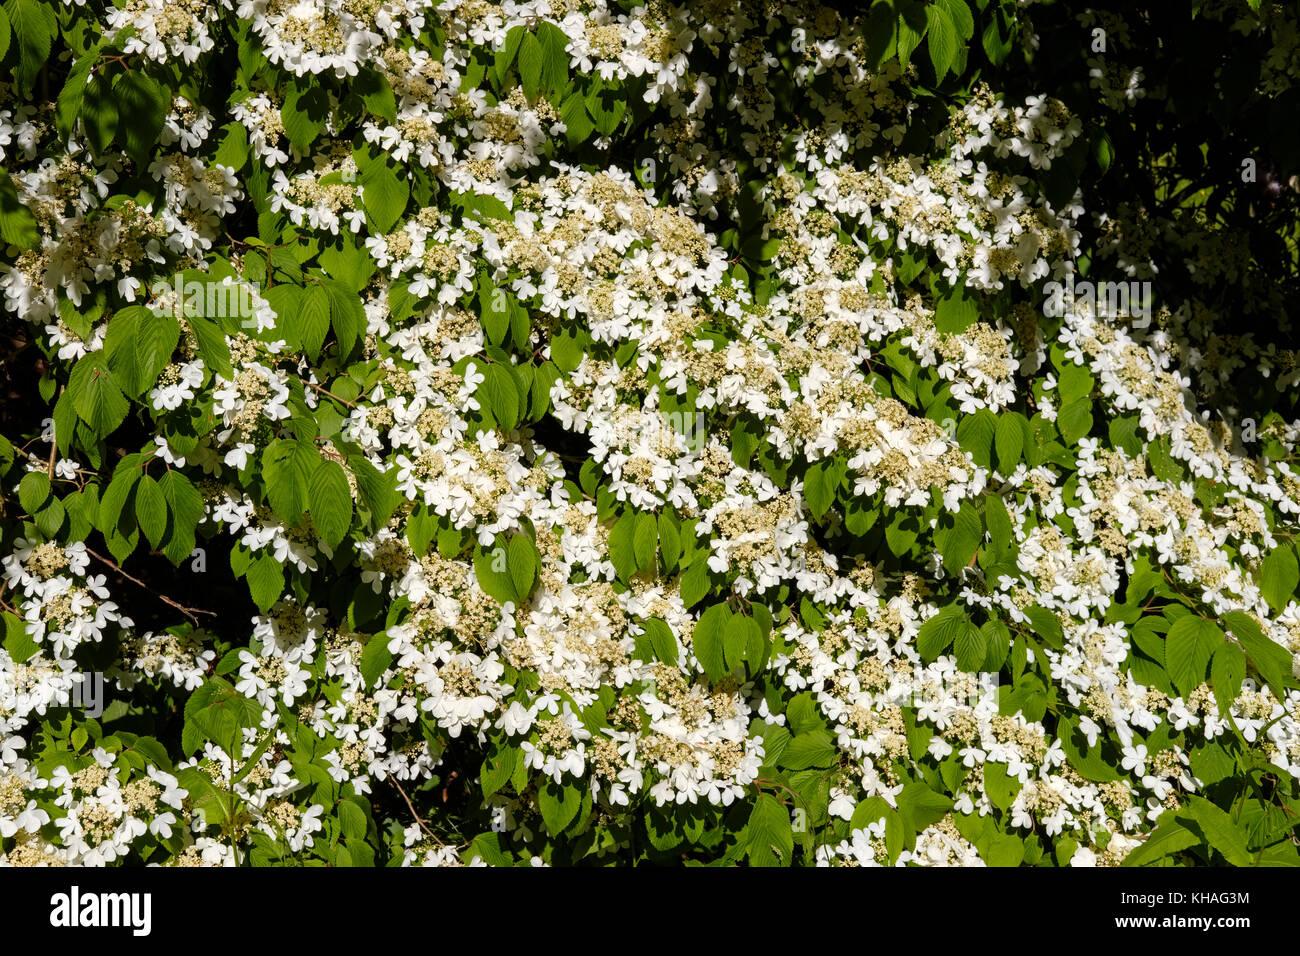 White flowering shrub, Japanese snowball (Viburnum plicatum), England, Great Britain - Stock Image